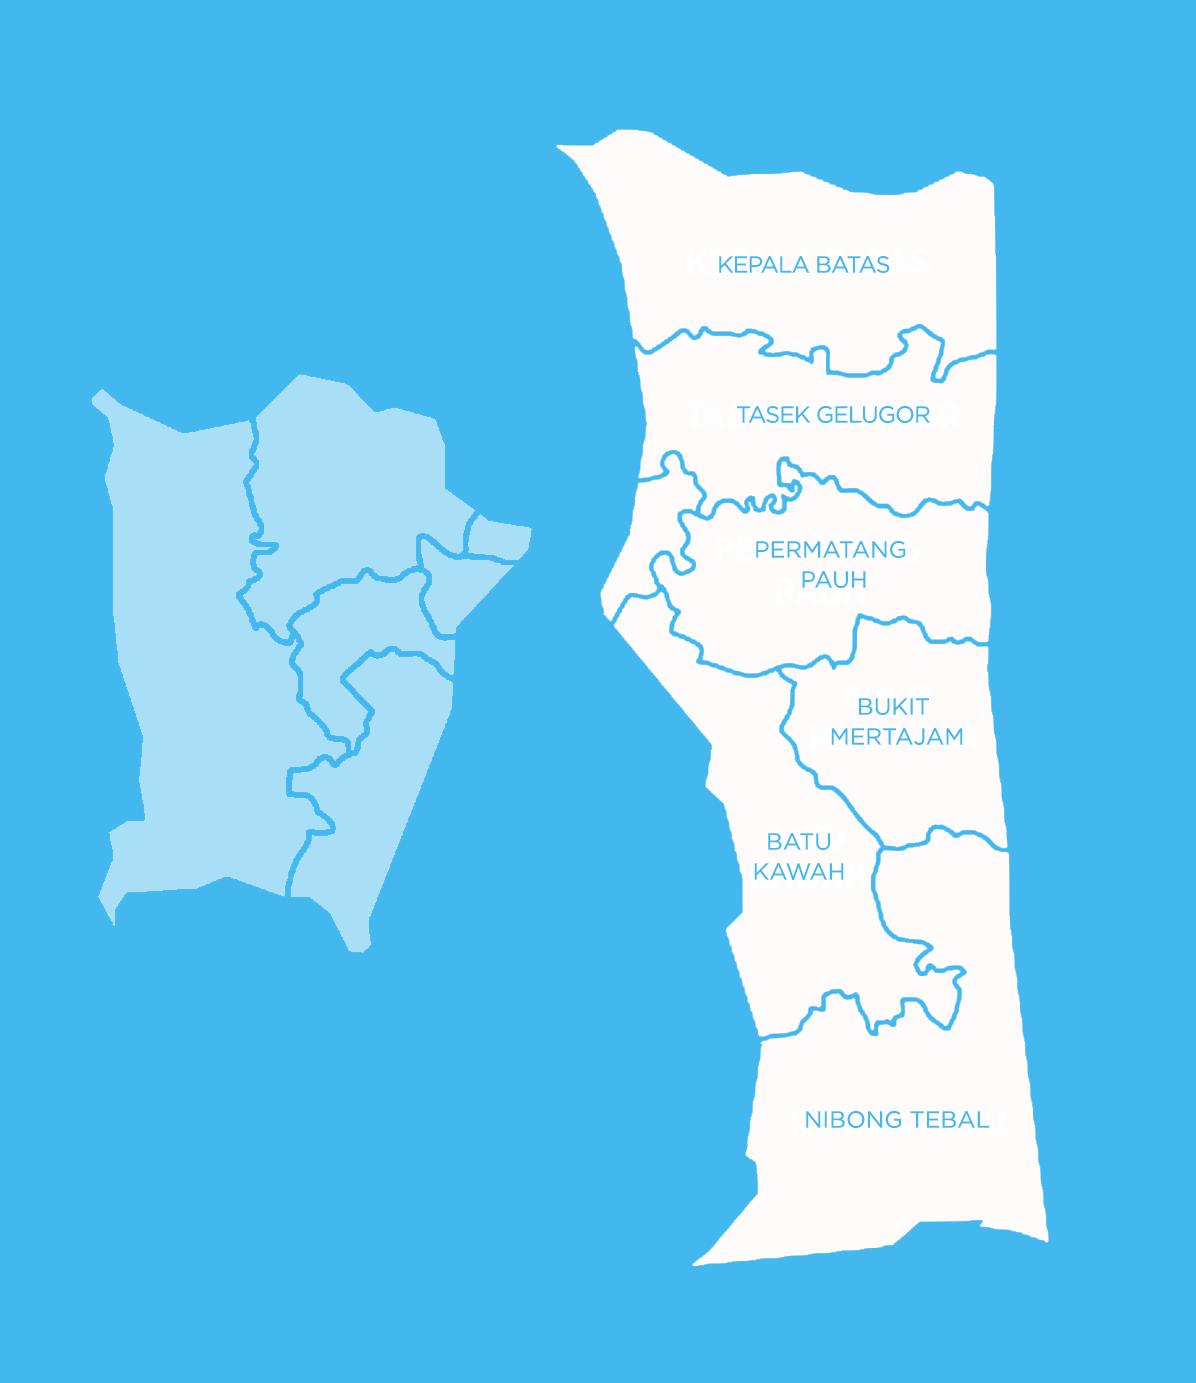 Koridor Utara : Pulau Pinang